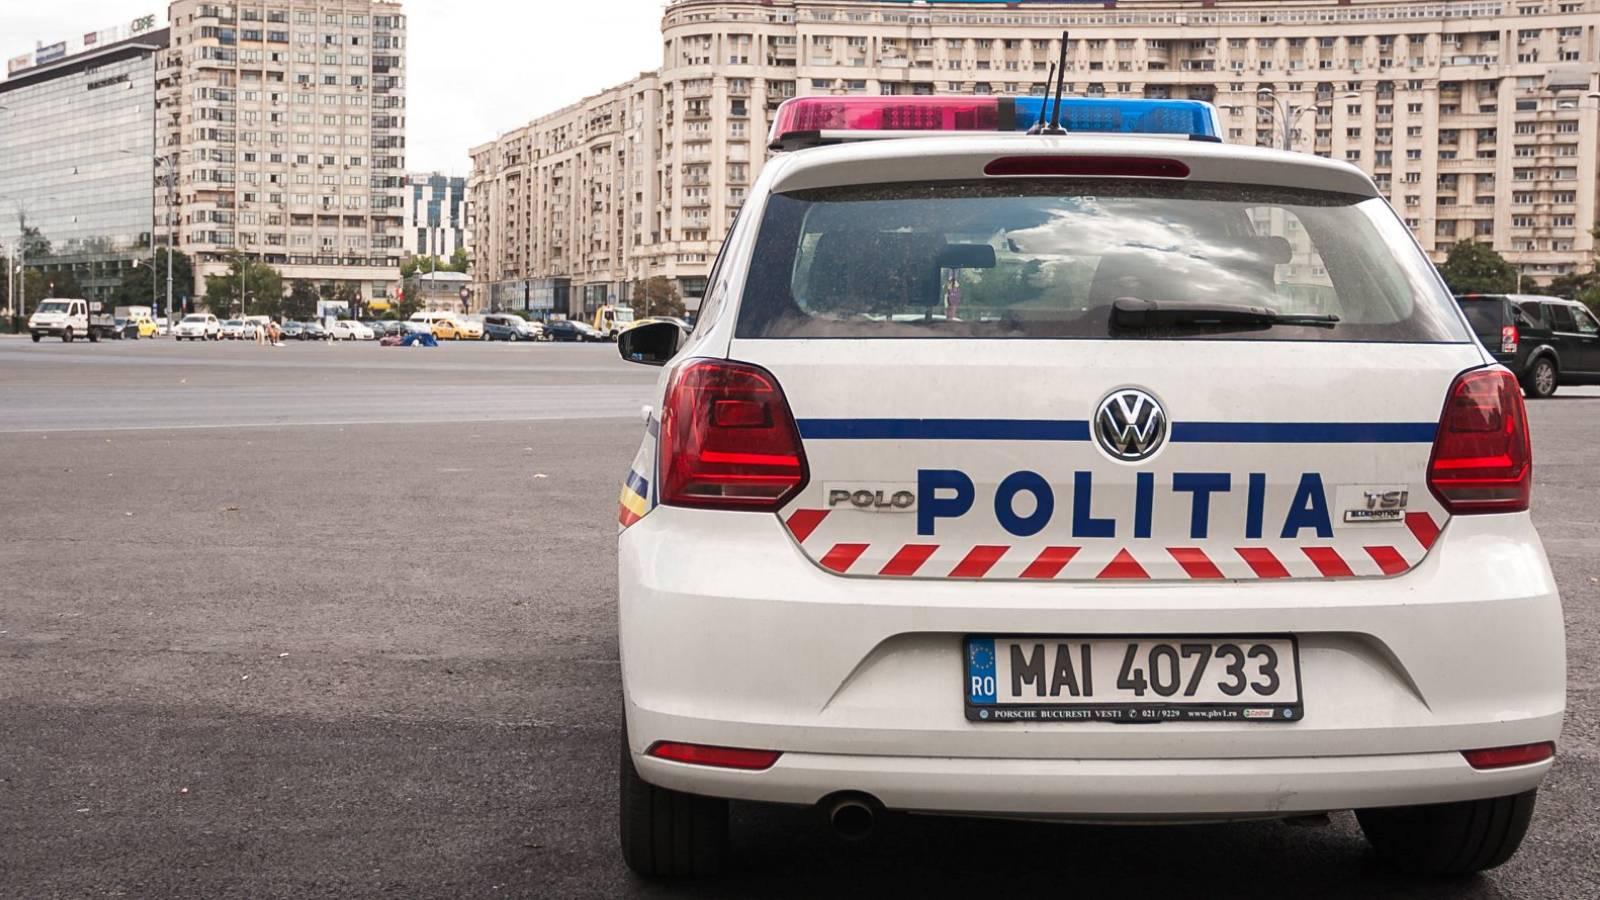 Politia Romana controale trafic retineri permise